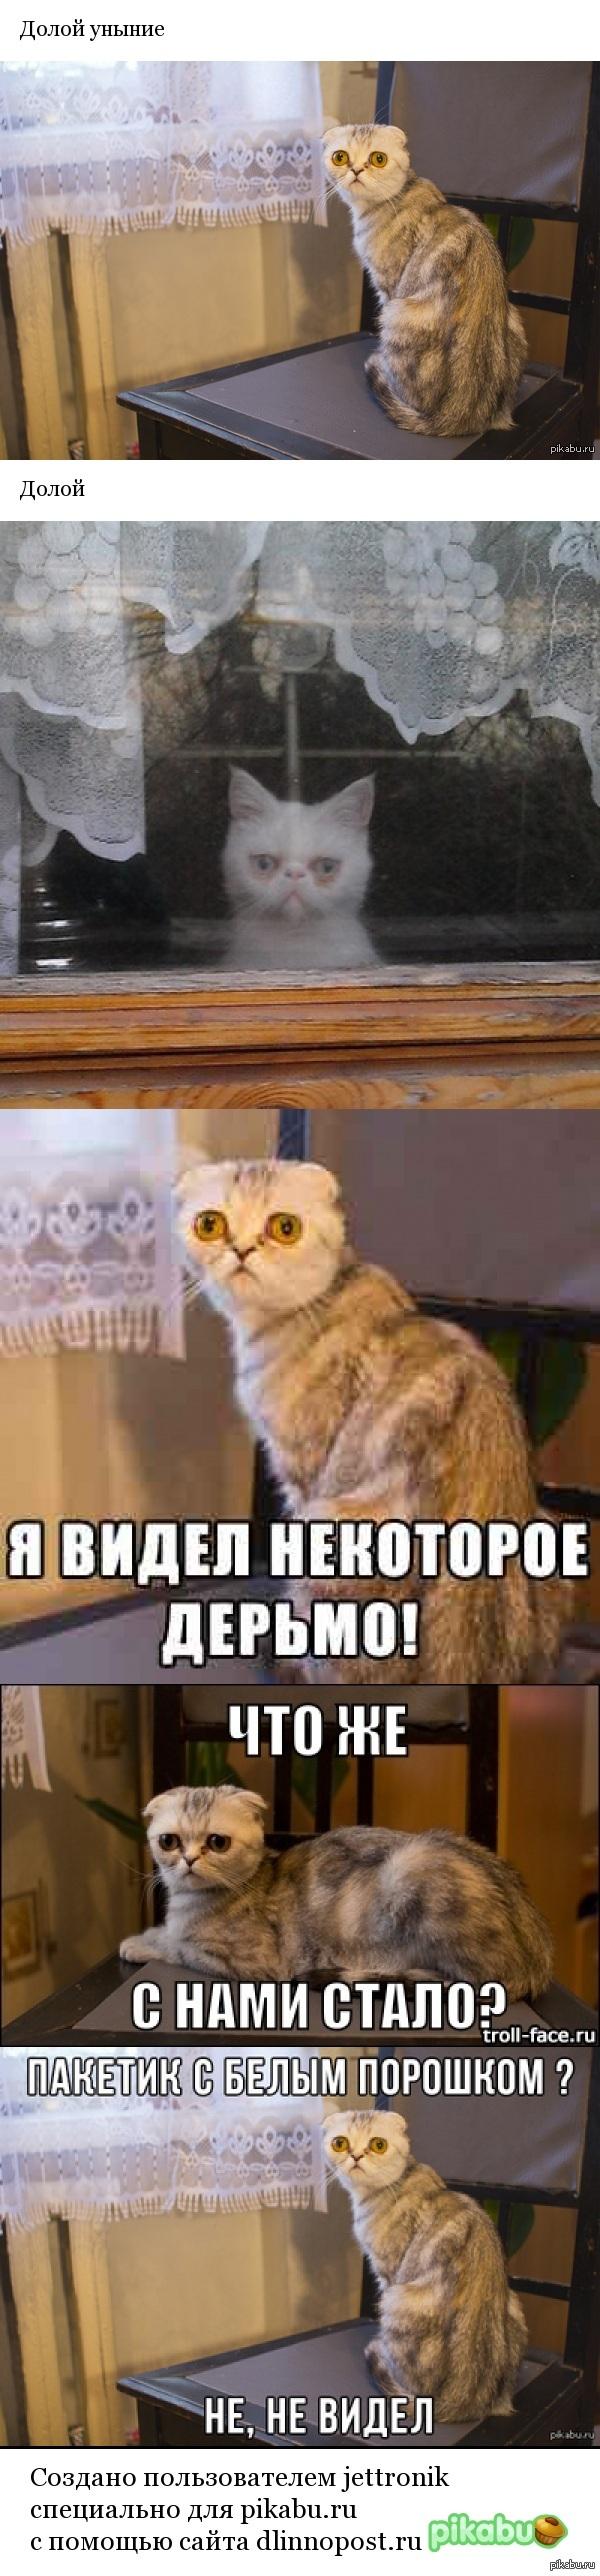 "Долой уныние взял с поста: <a href=""http://pikabu.ru/story/yeto_voobshche_normalno_chto_on_takoy_2719844"">http://pikabu.ru/story/_2719844</a>"